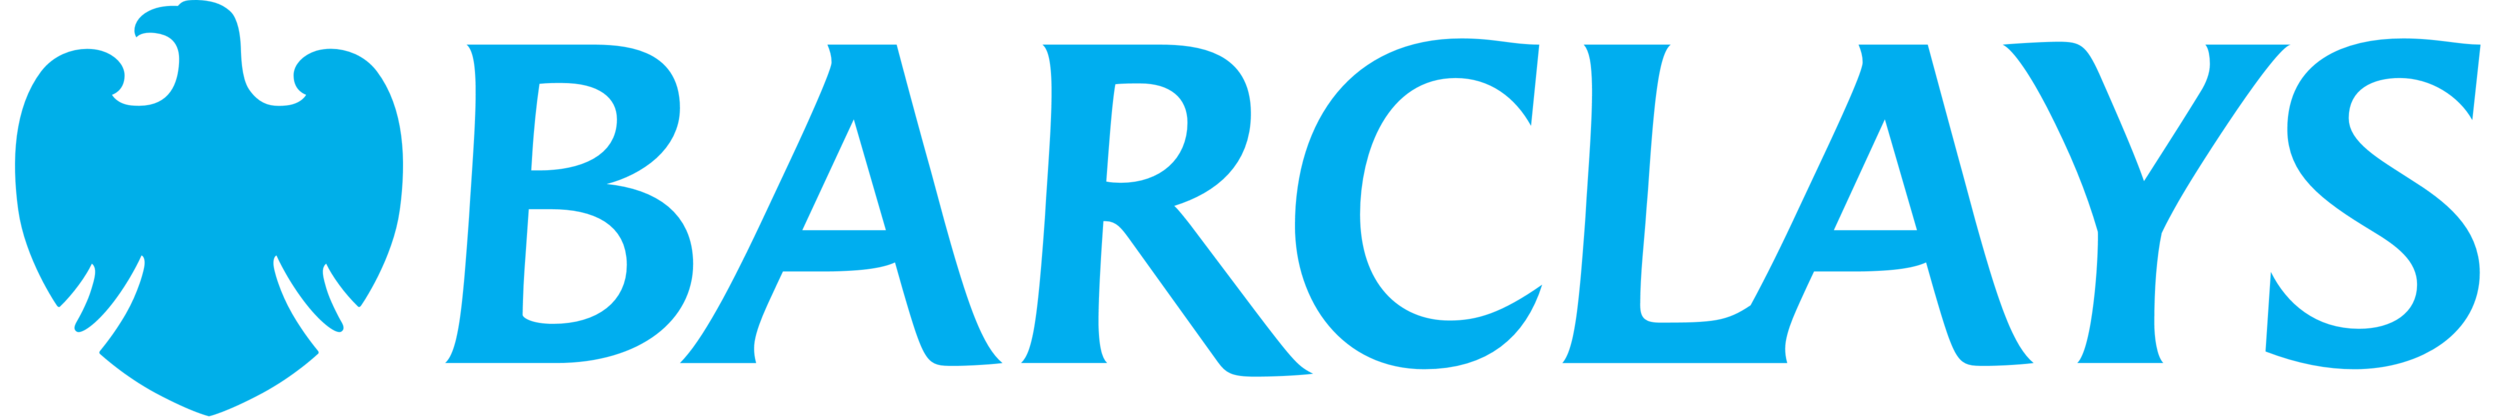 Barclays_logo_logotype.png